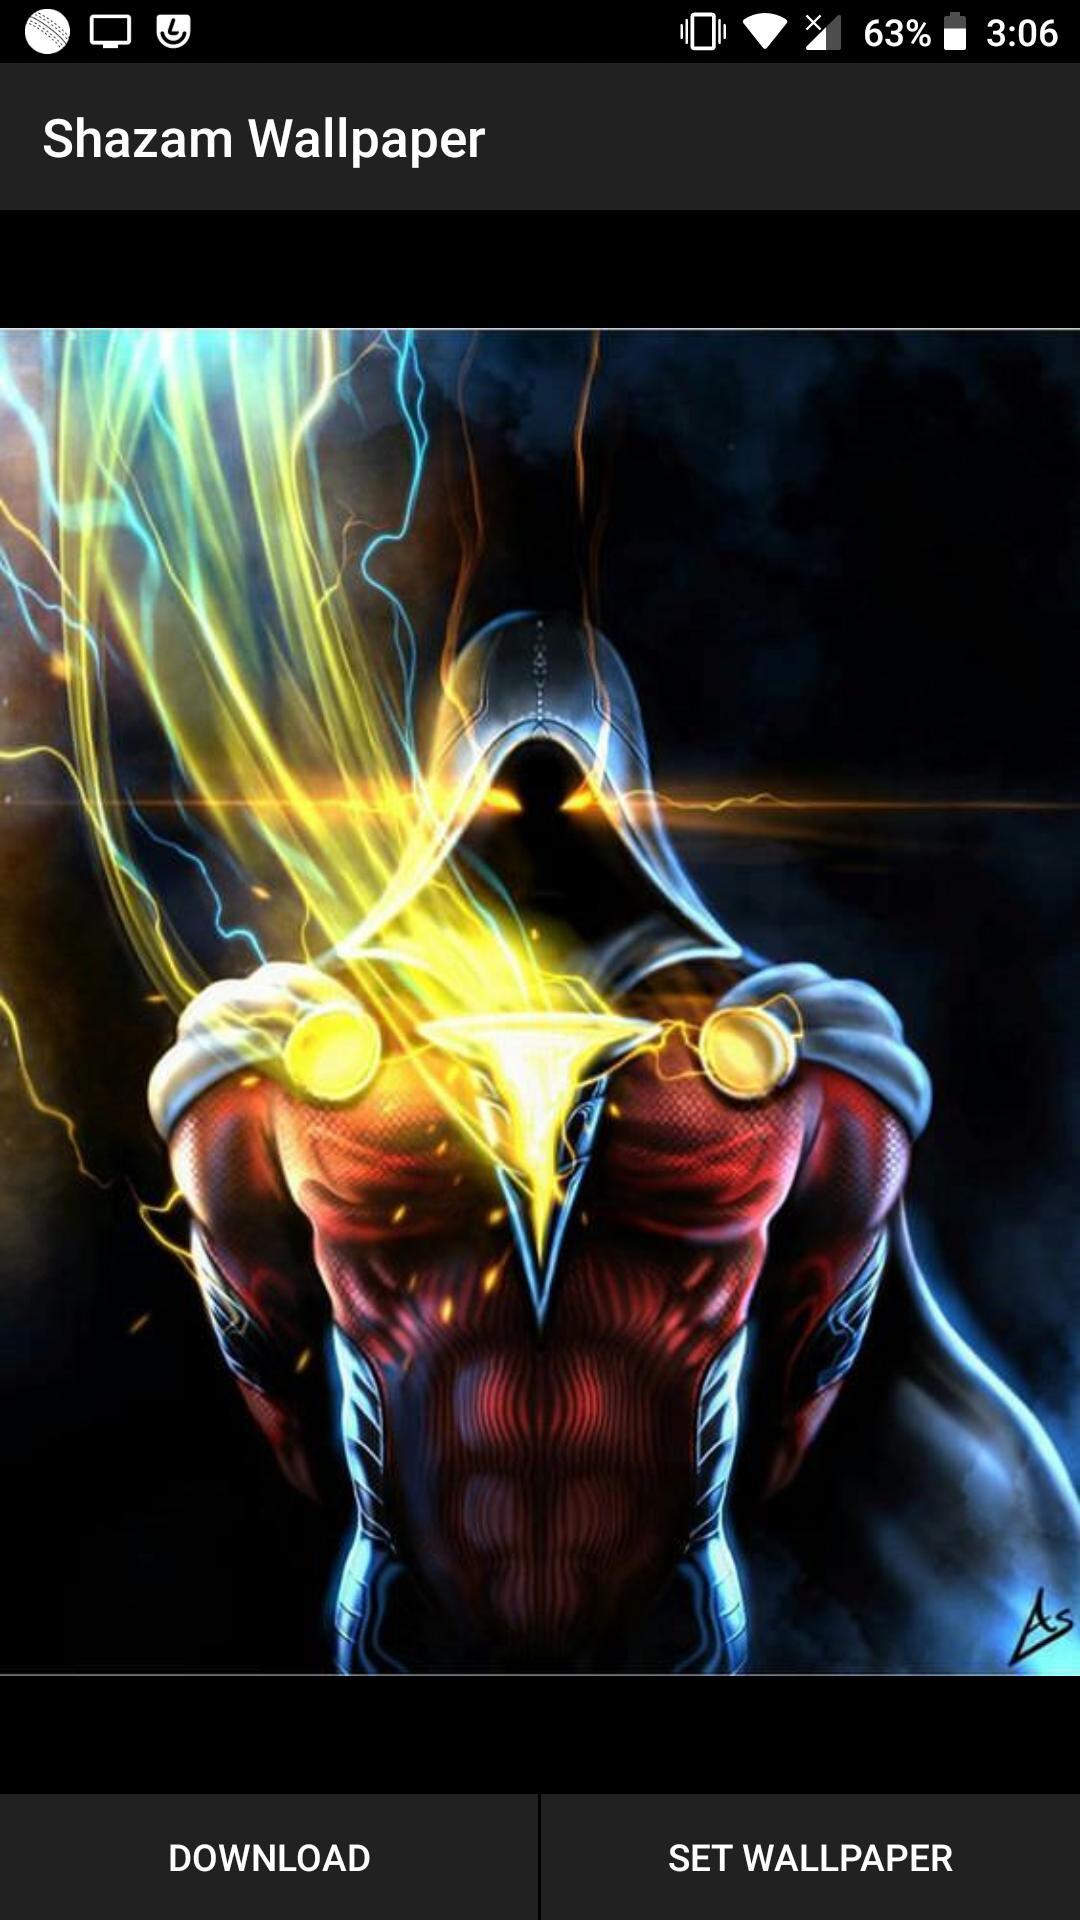 Free Download Sha Zam Superhero Wallpaper Hd 4k Backgrounds For